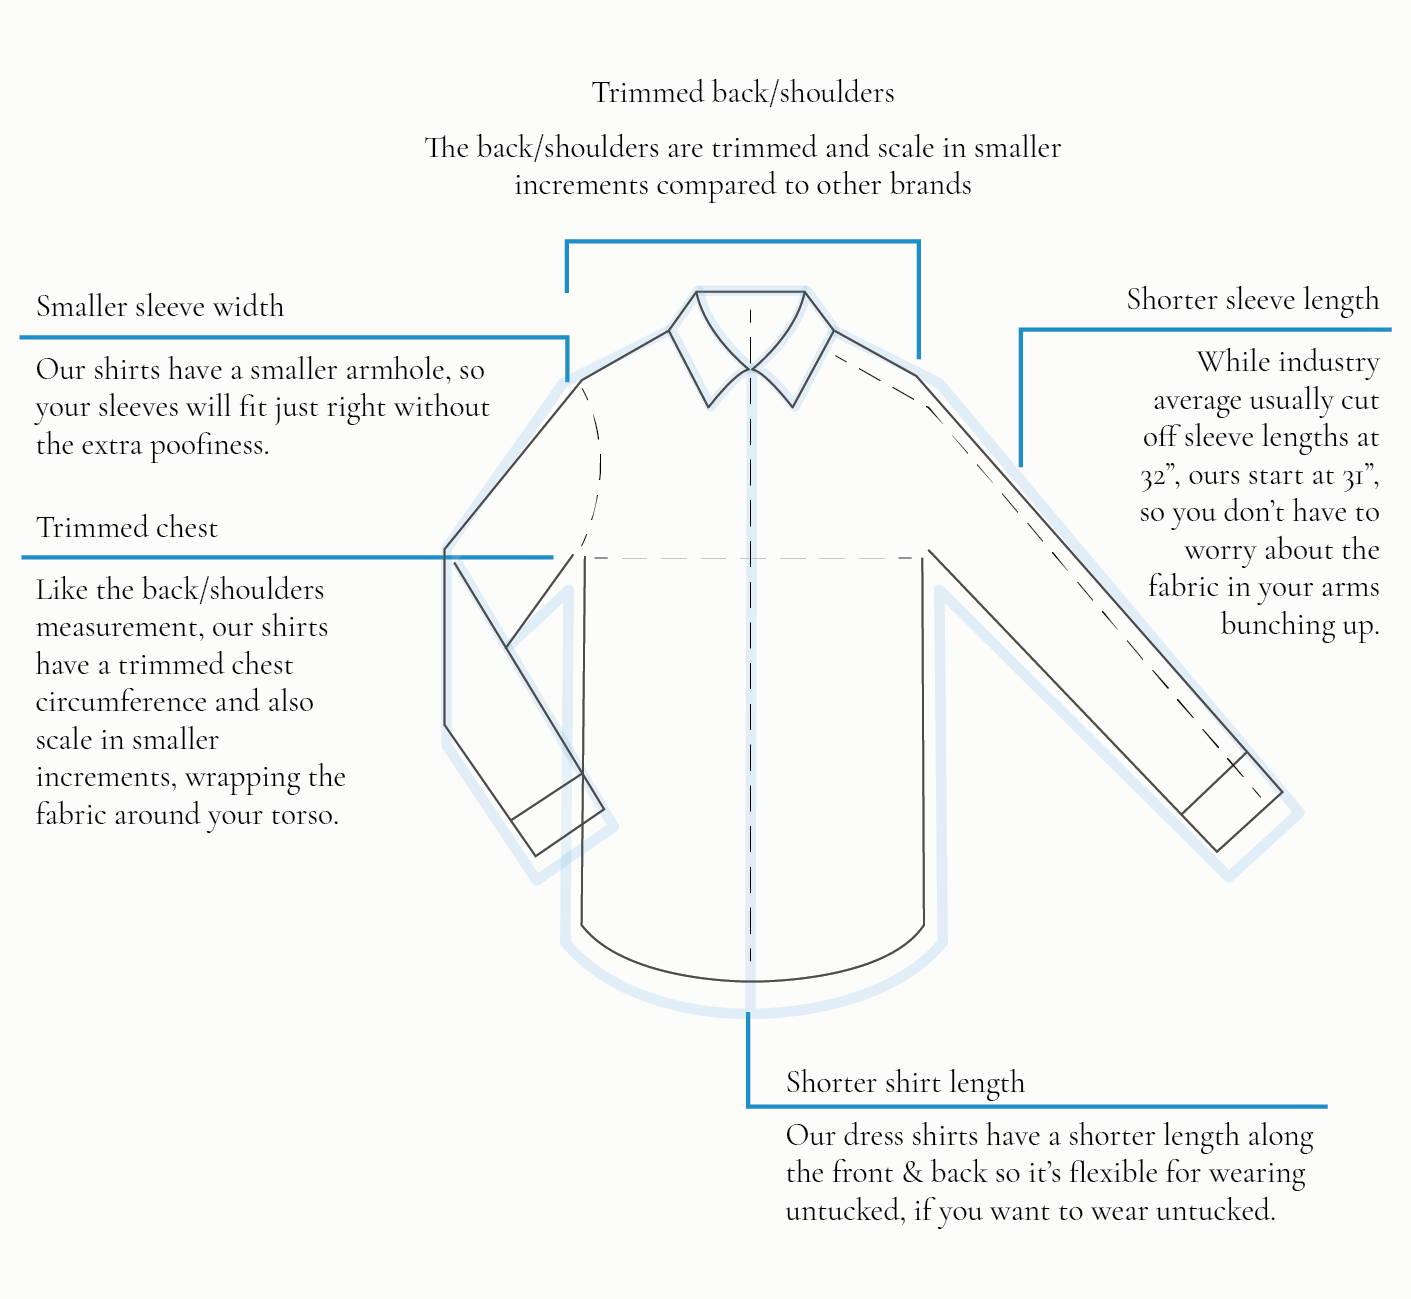 slim-dress-shirt-infographic-sleeves-chest-shirt-length